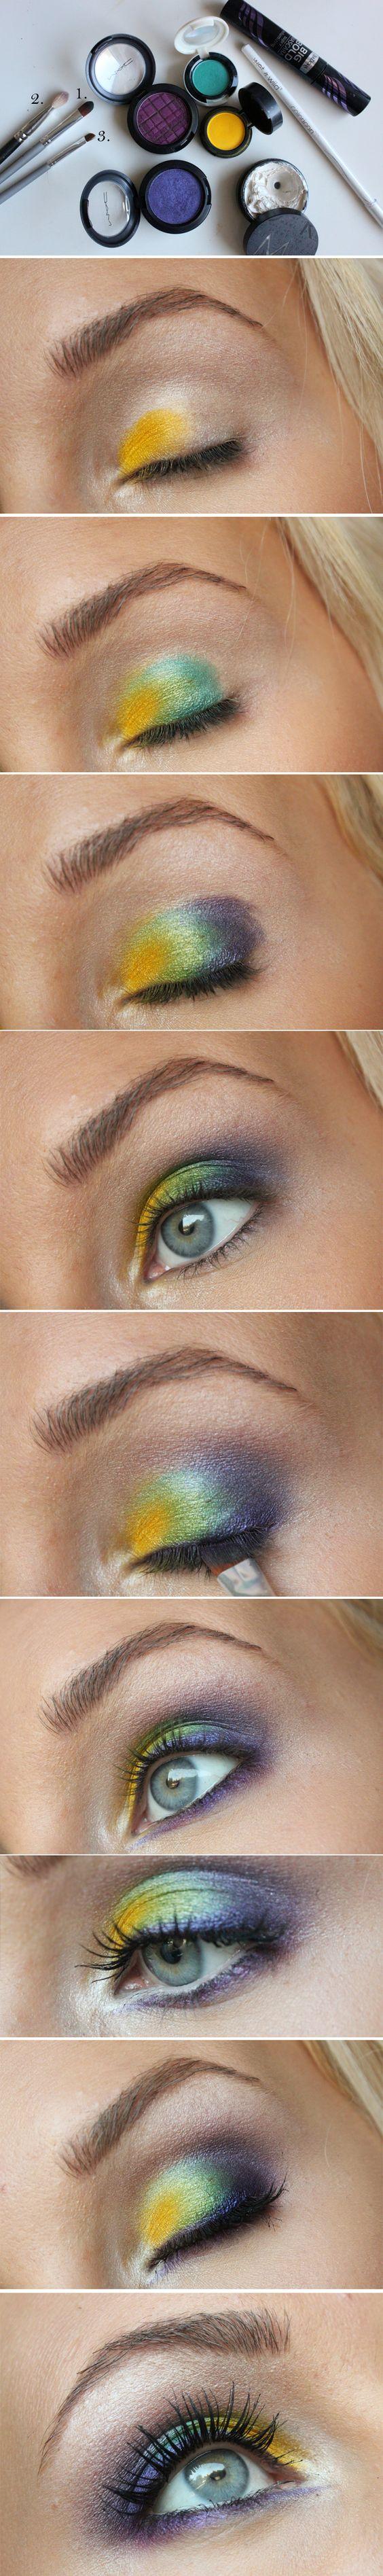 Helen Torsgården - colored eyeshadow